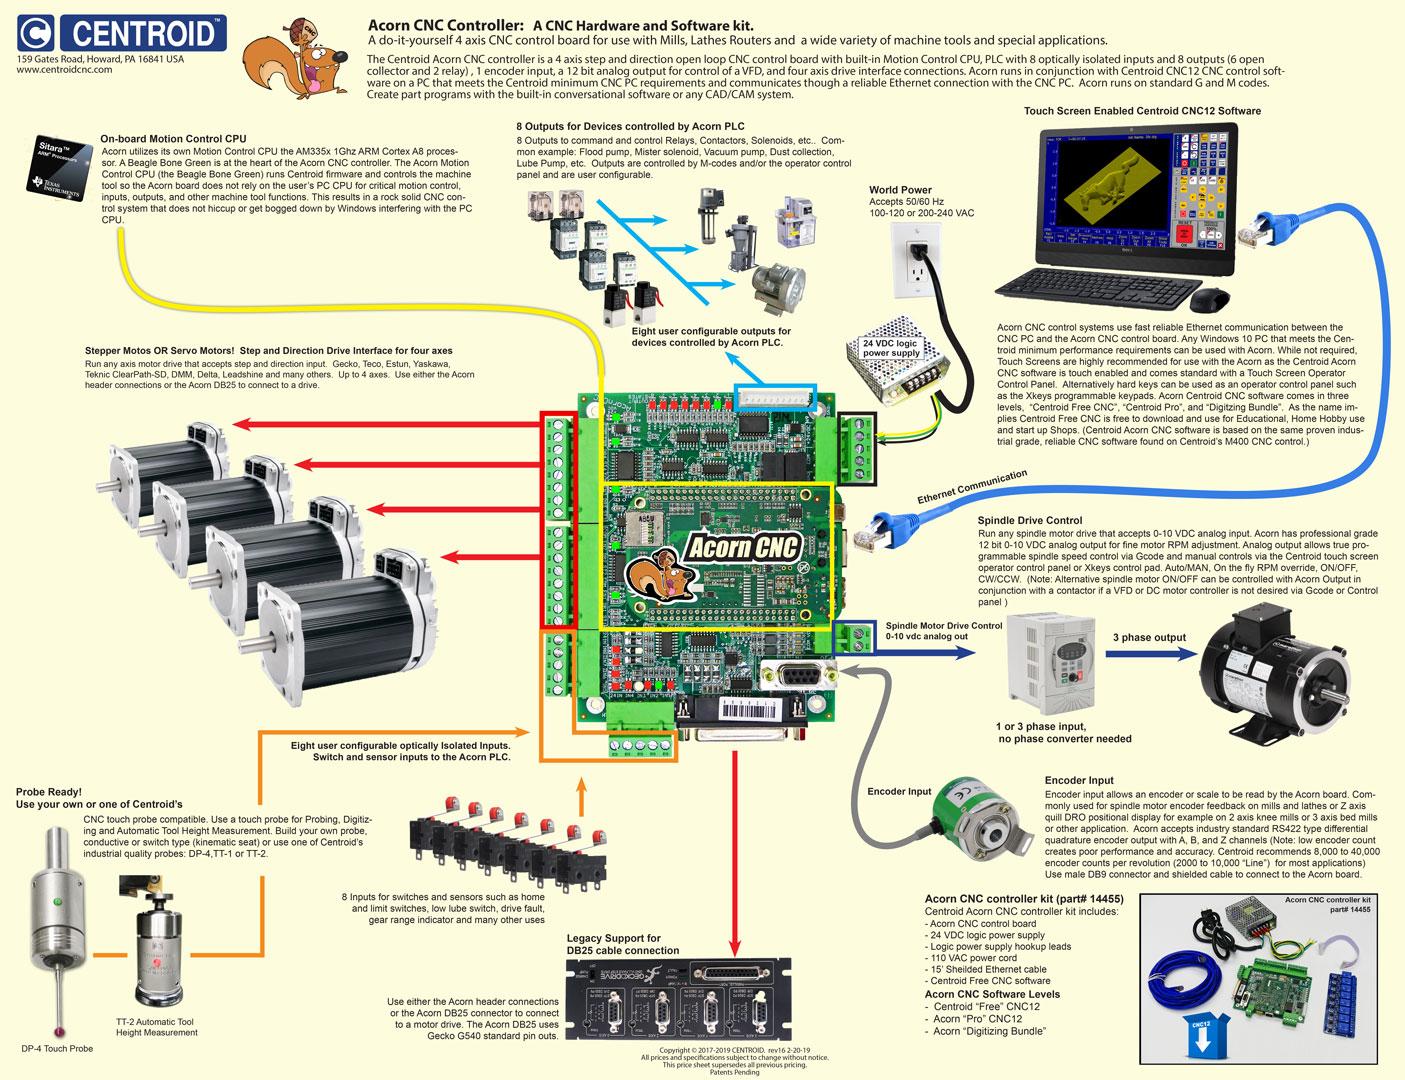 Super Cnc Controller Wiring Diagram Online Wiring Diagram Wiring Cloud Geisbieswglorg